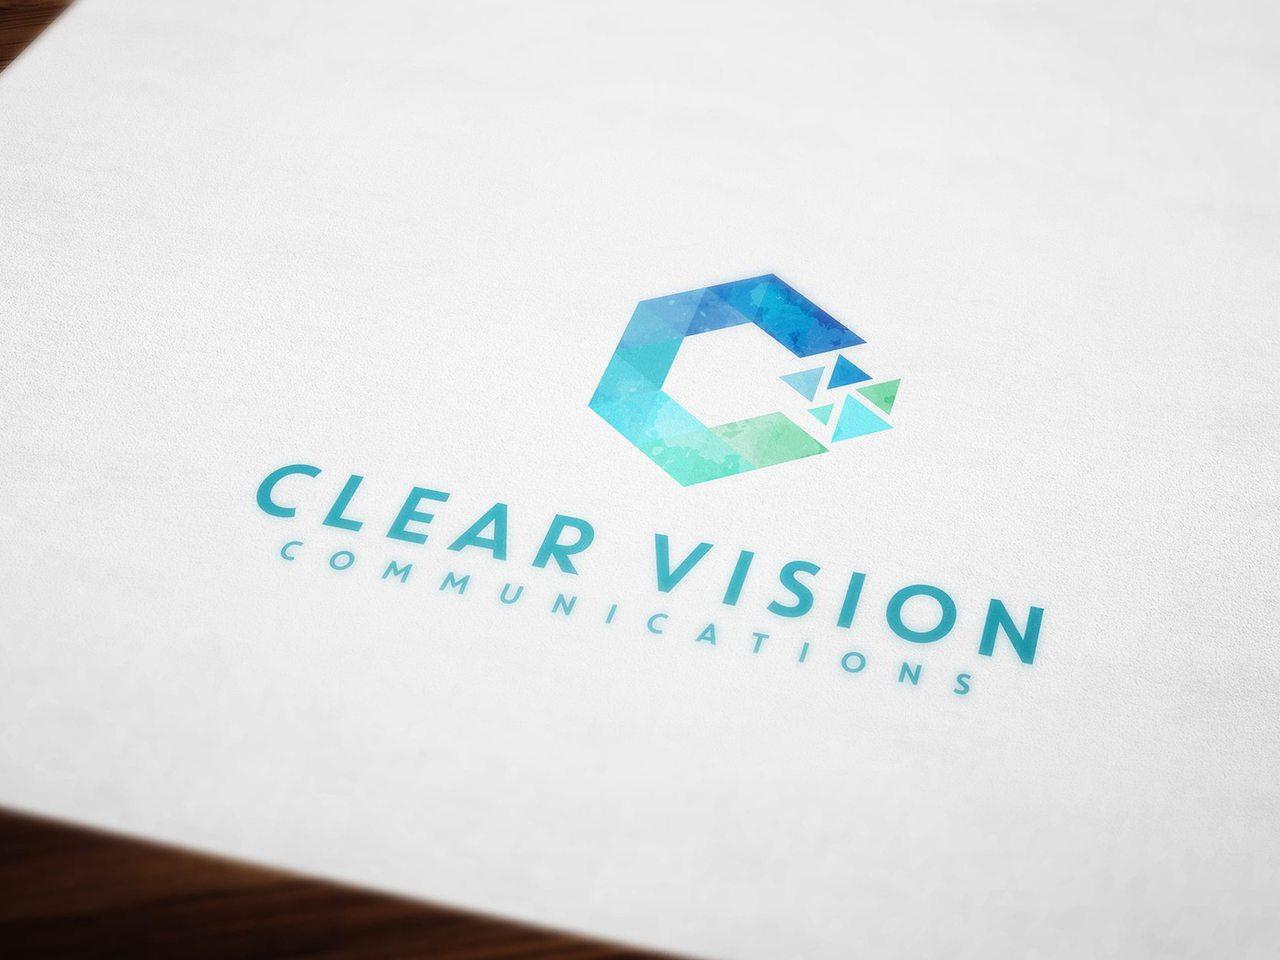 Cleveland Graphic Design